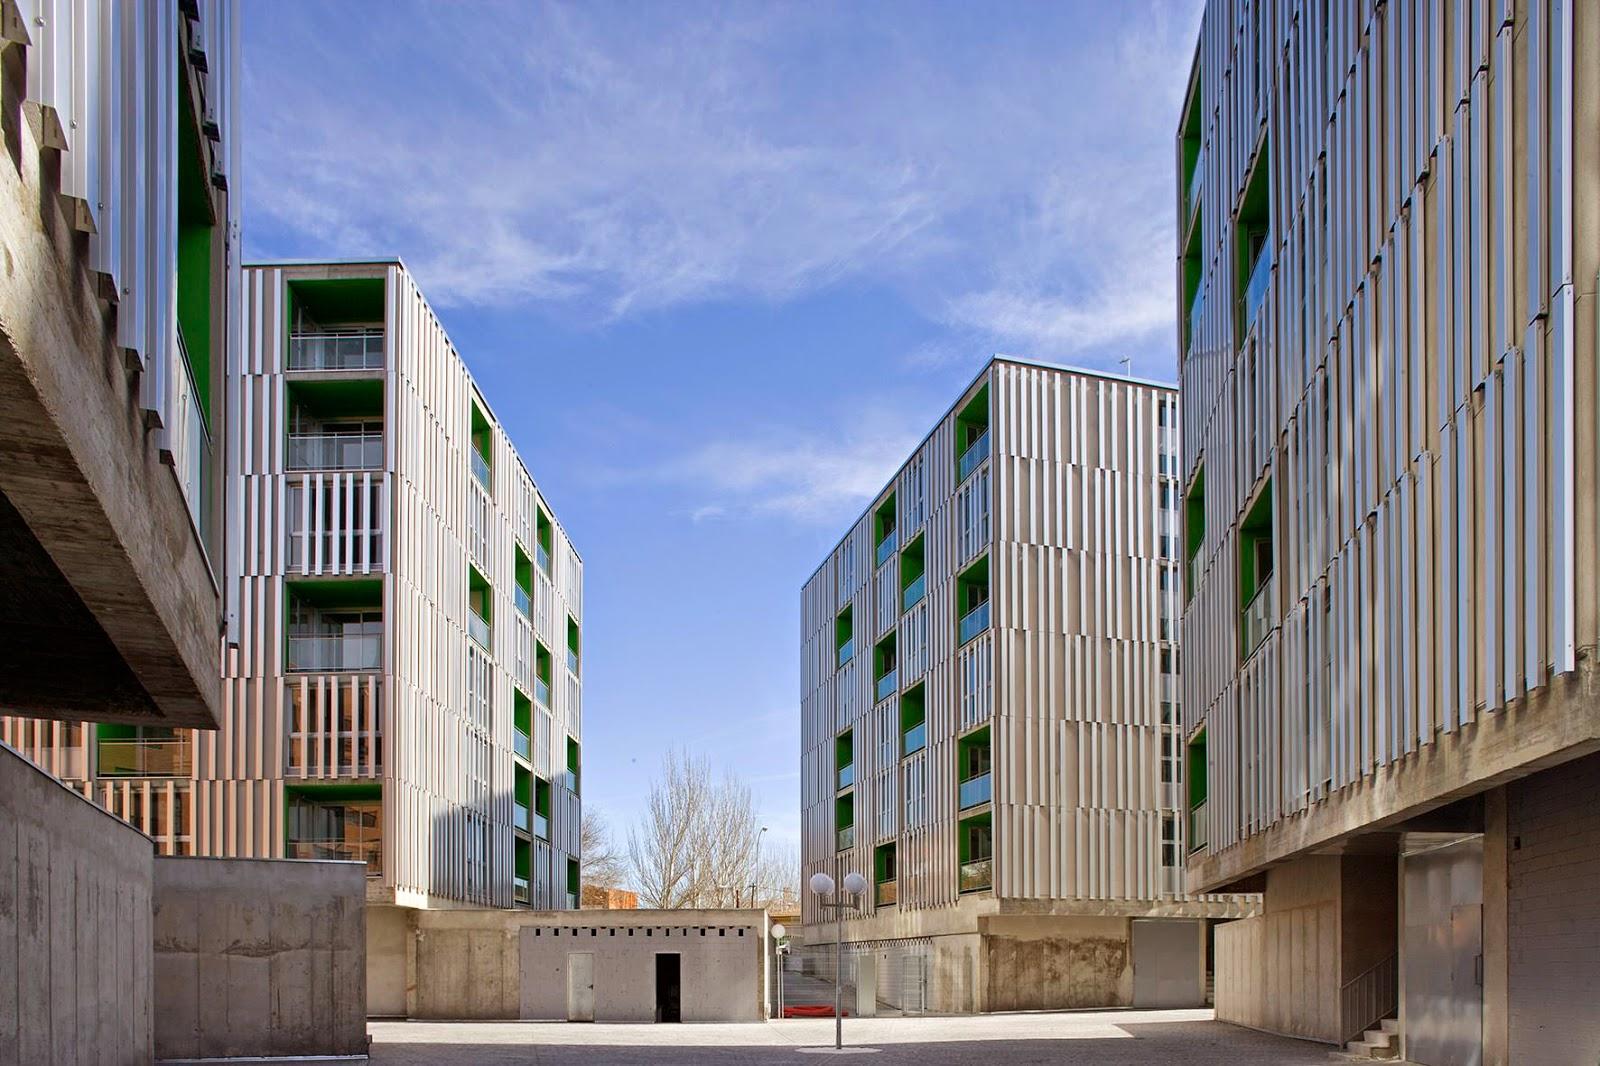 Arquitectura zona cero constructing situations 156 viviendas de alquiler en parla madrid de - Arquitectos interioristas madrid ...